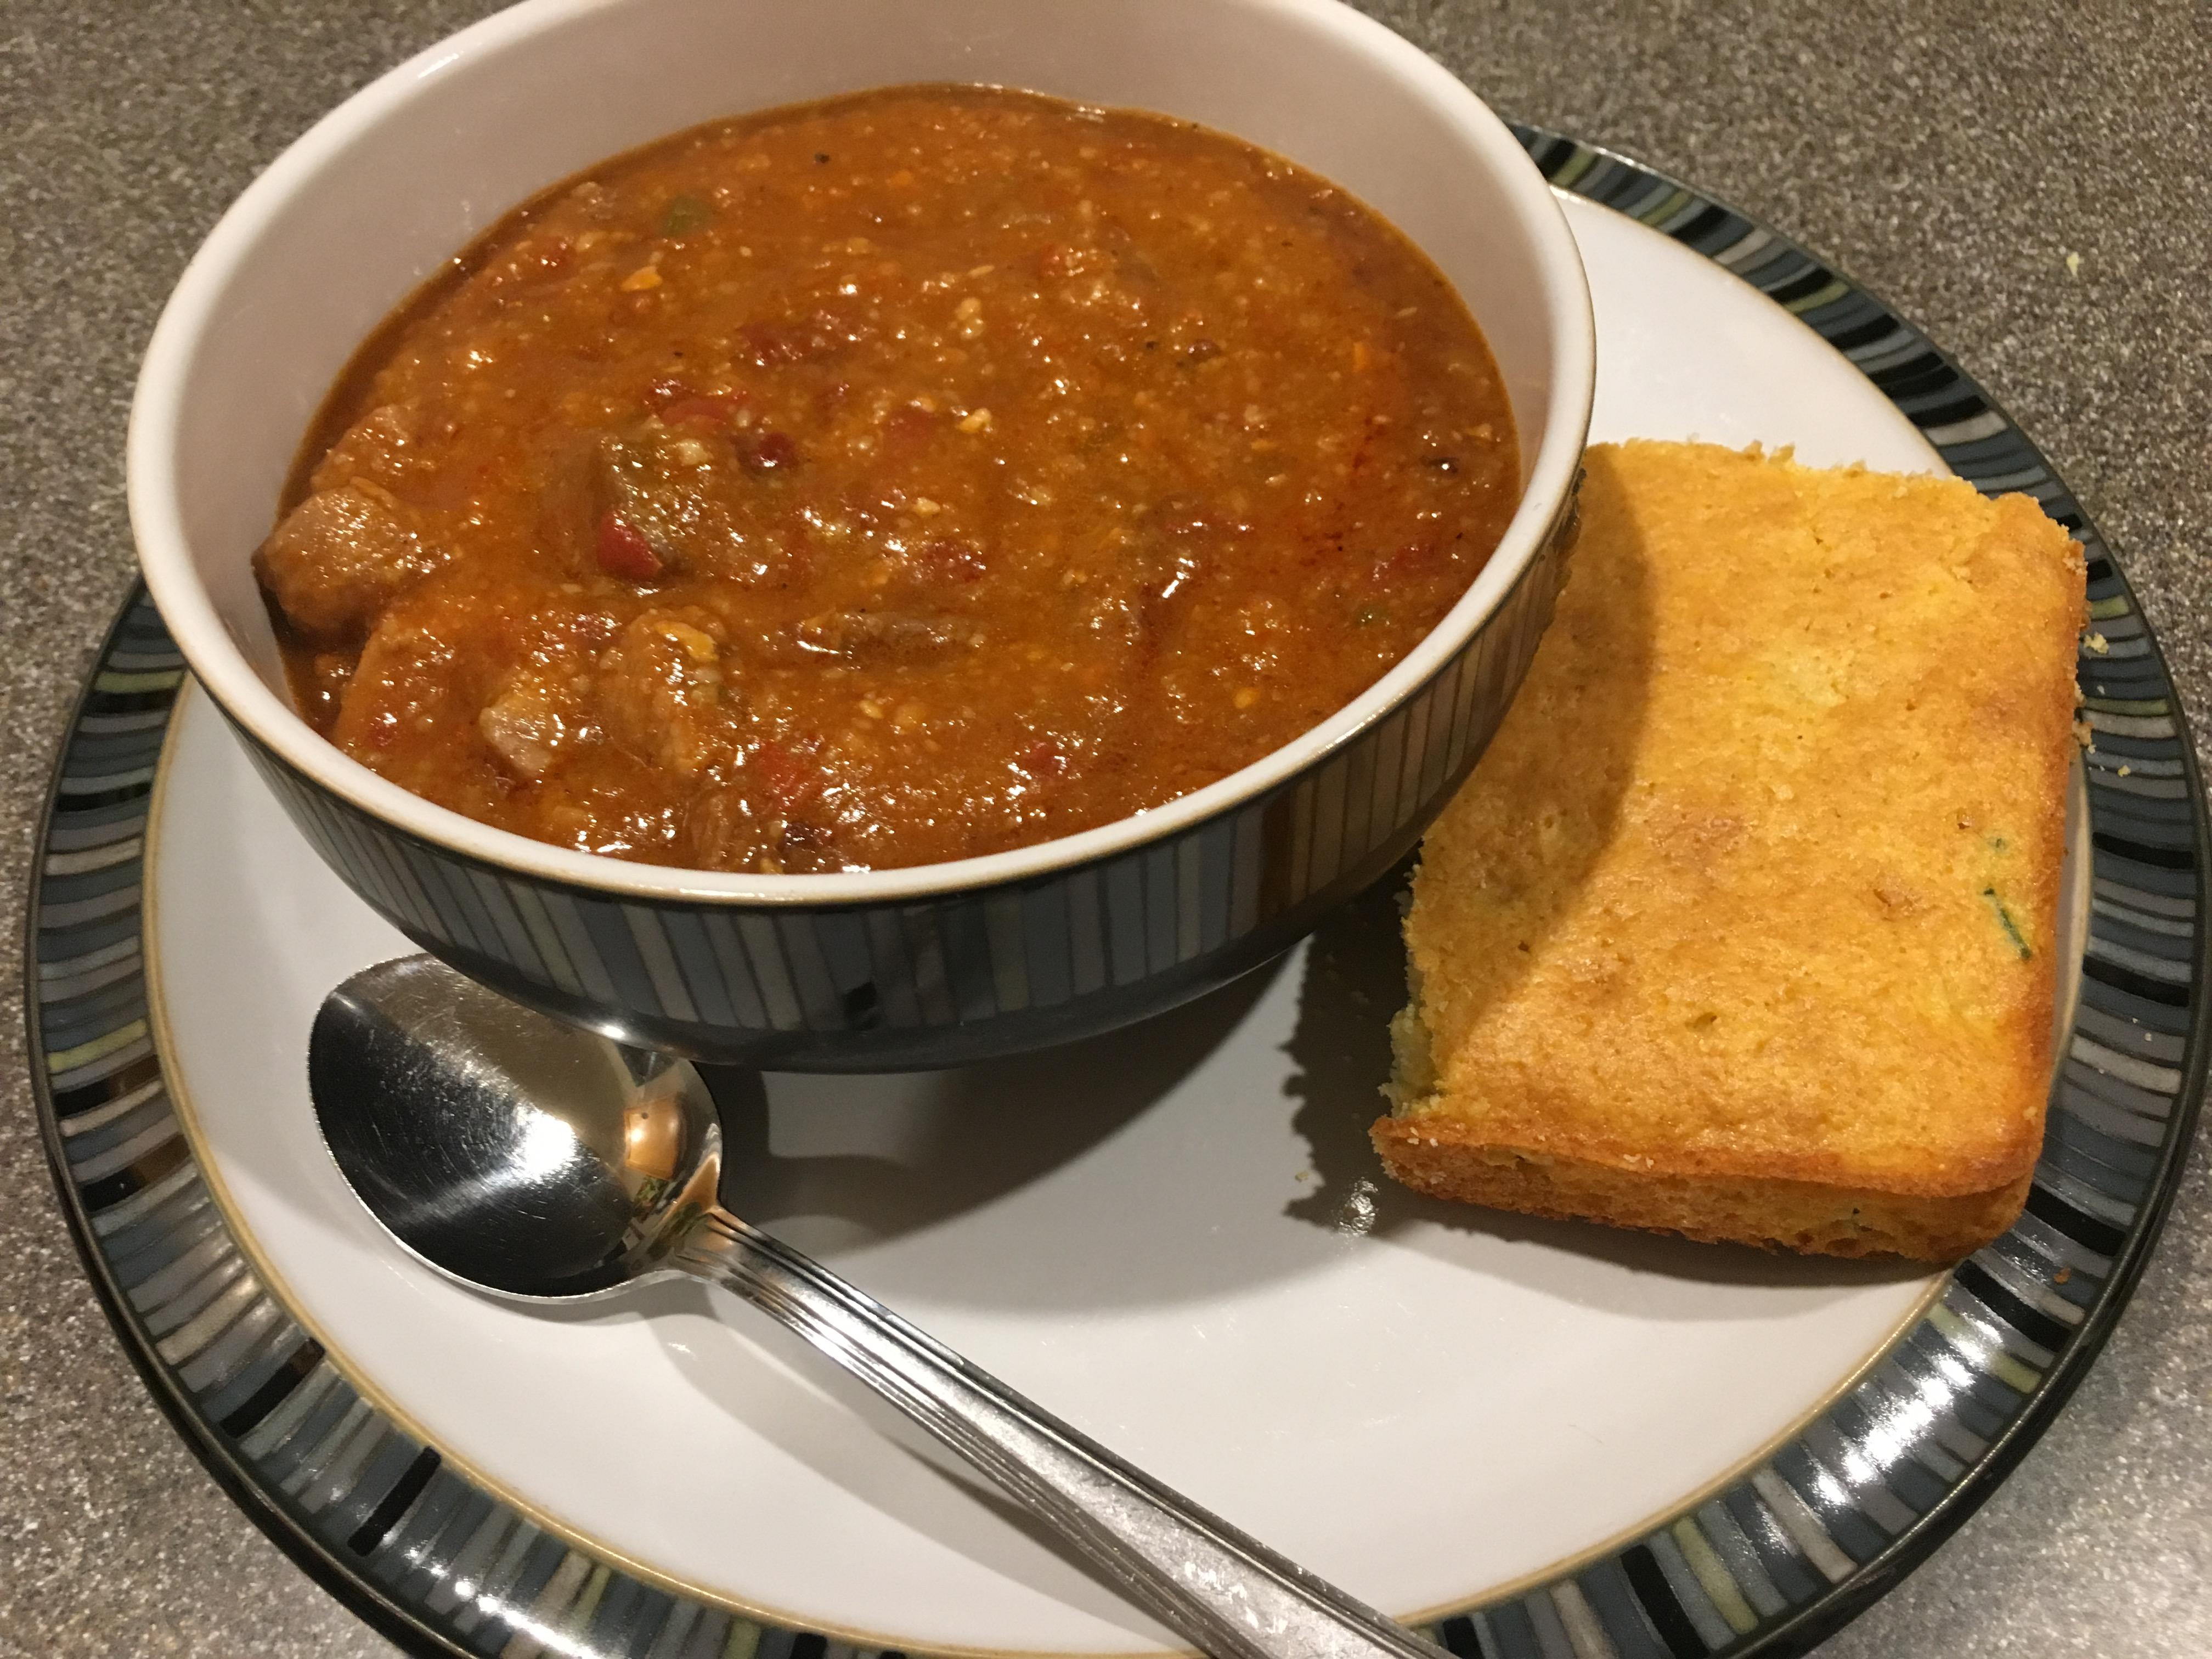 Episode 110 The Big Chili Allison Cooks Alton S Good Eats